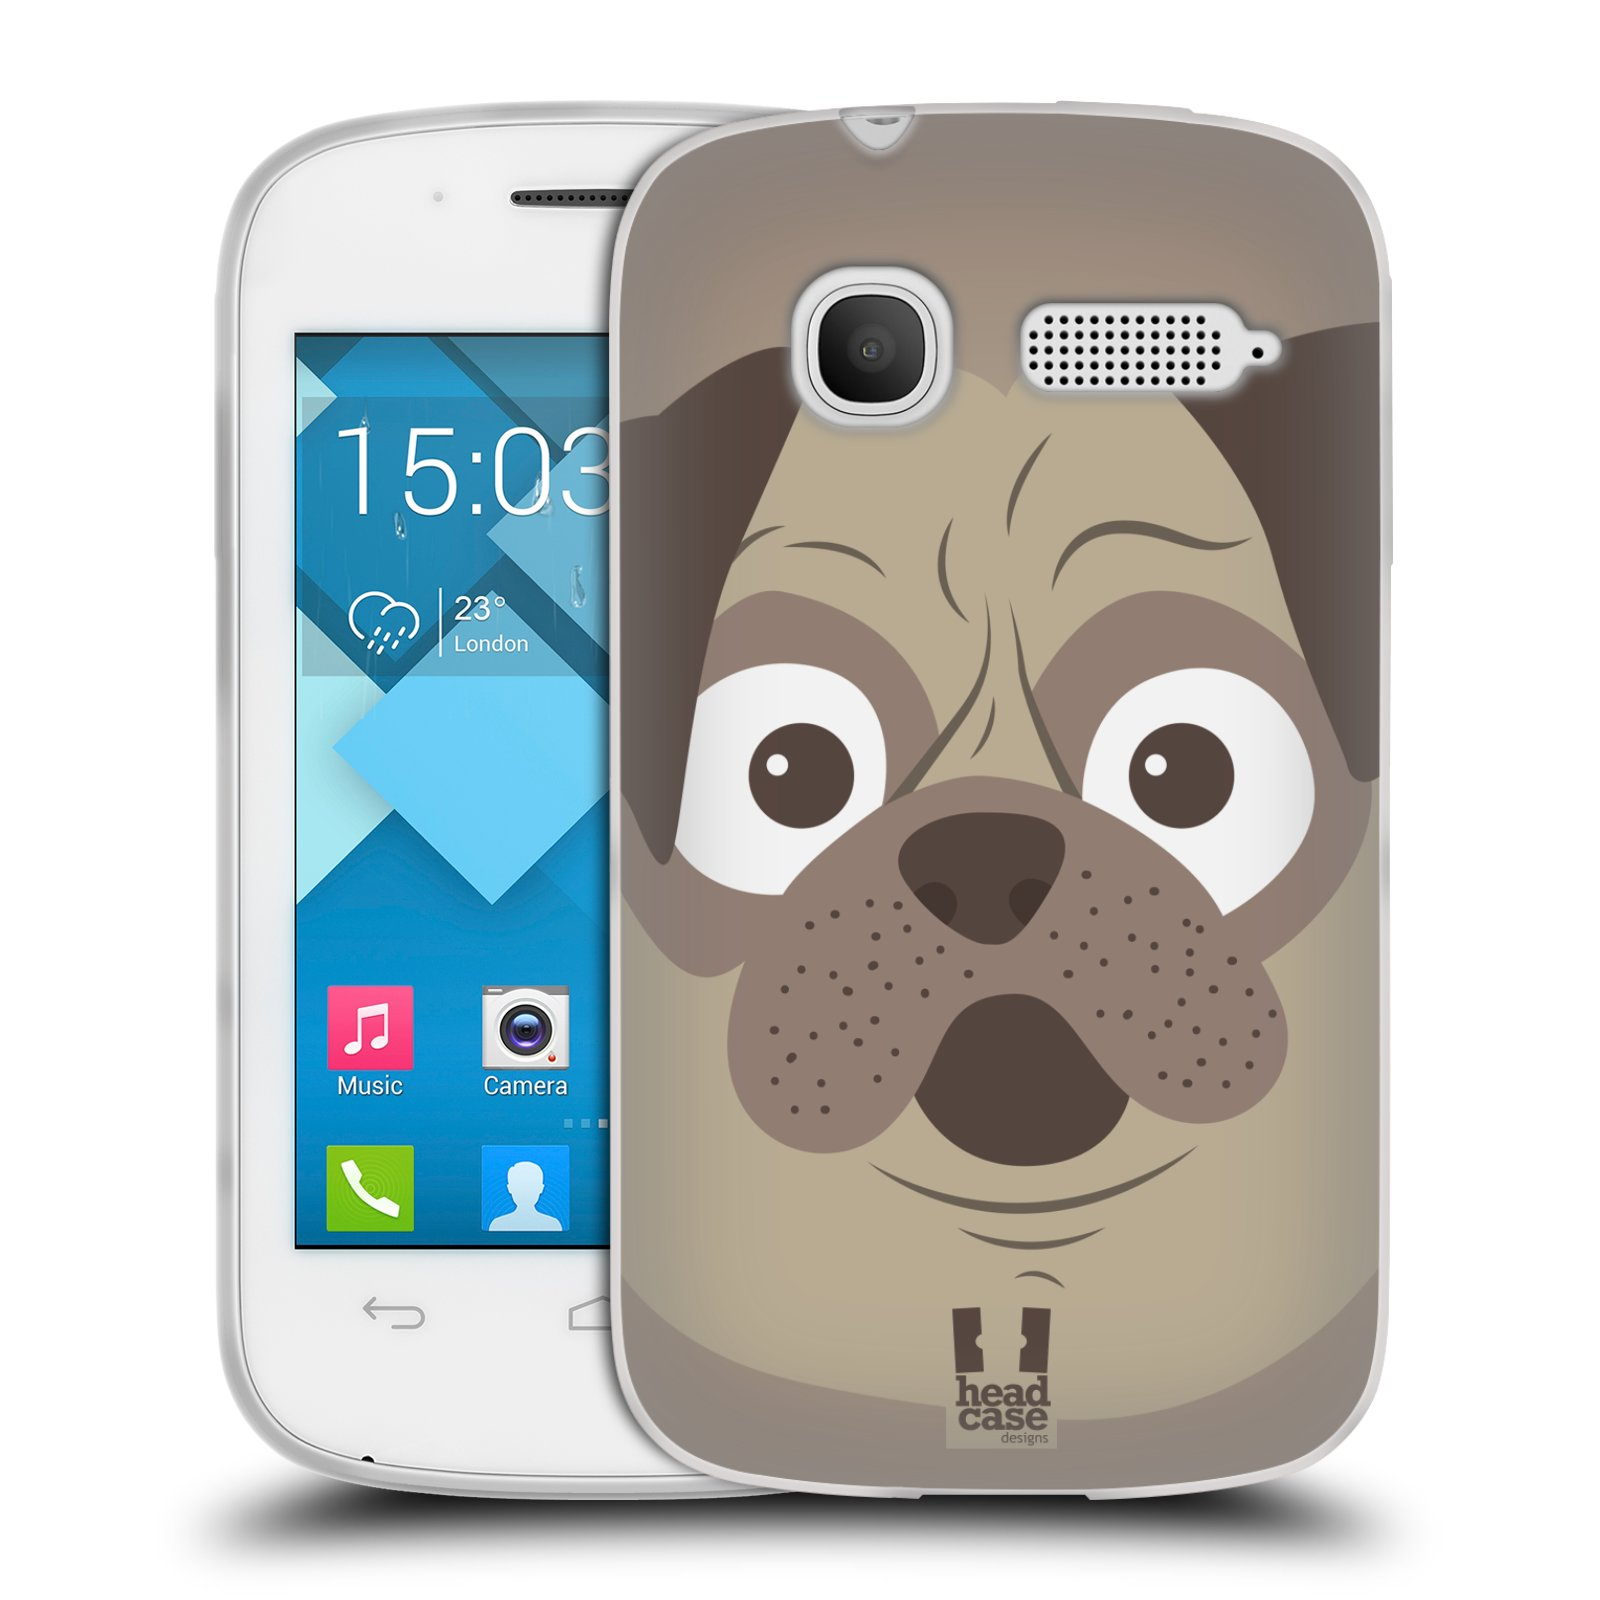 HEAD CASE silikonový obal na mobil Alcatel POP C1 OT-4015D vzor Cartoon Karikatura barevná kreslená zvířátka pes mopsík